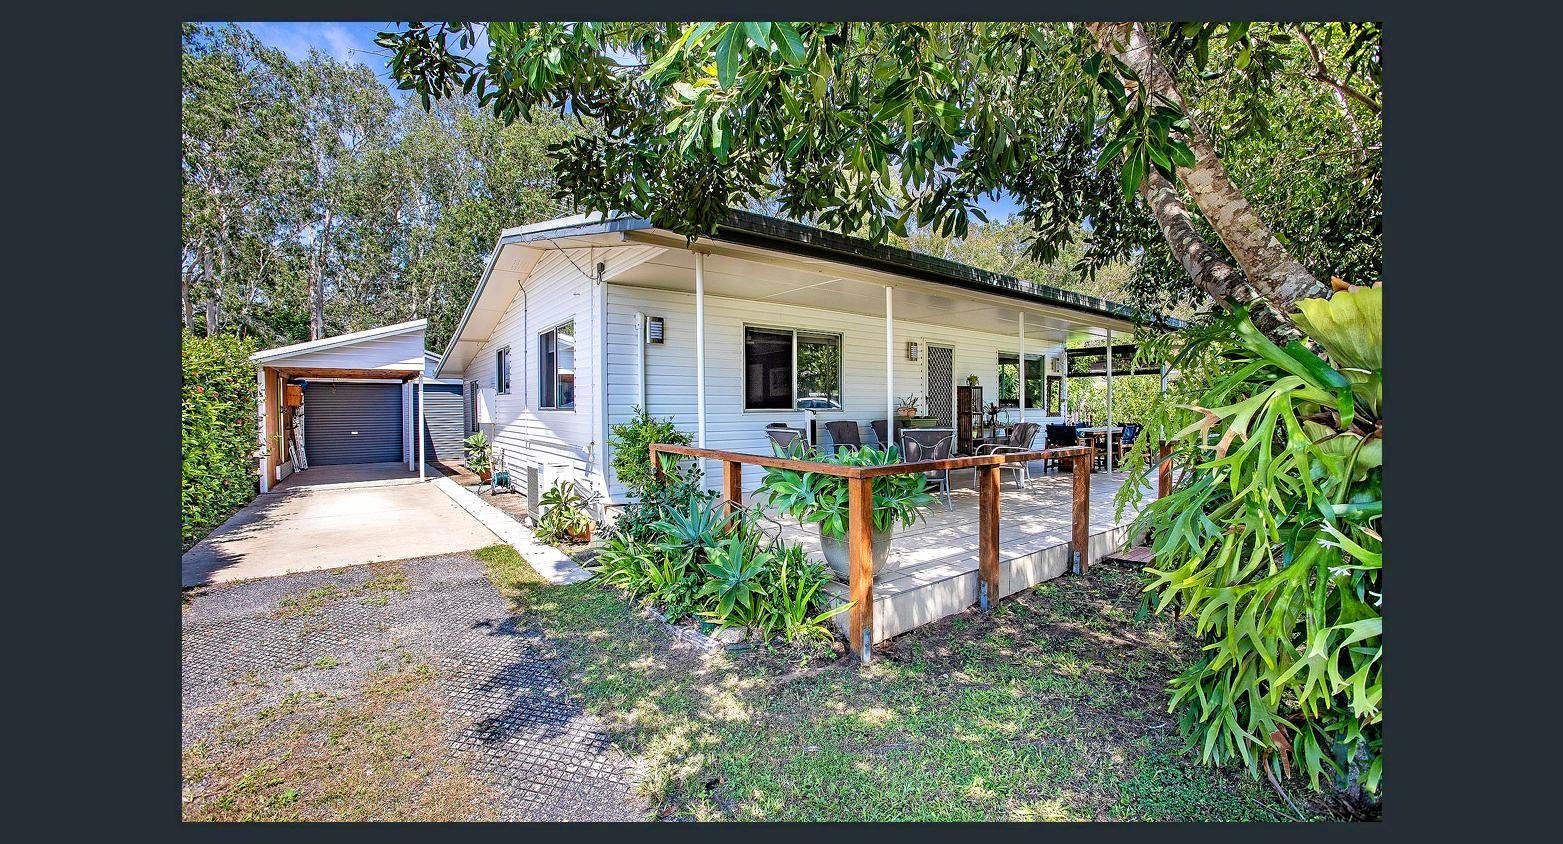 28 Buoro Street, Ball Bay, Qld 4741 - 2 bedroom, 1 bathroom, 3 car spaces